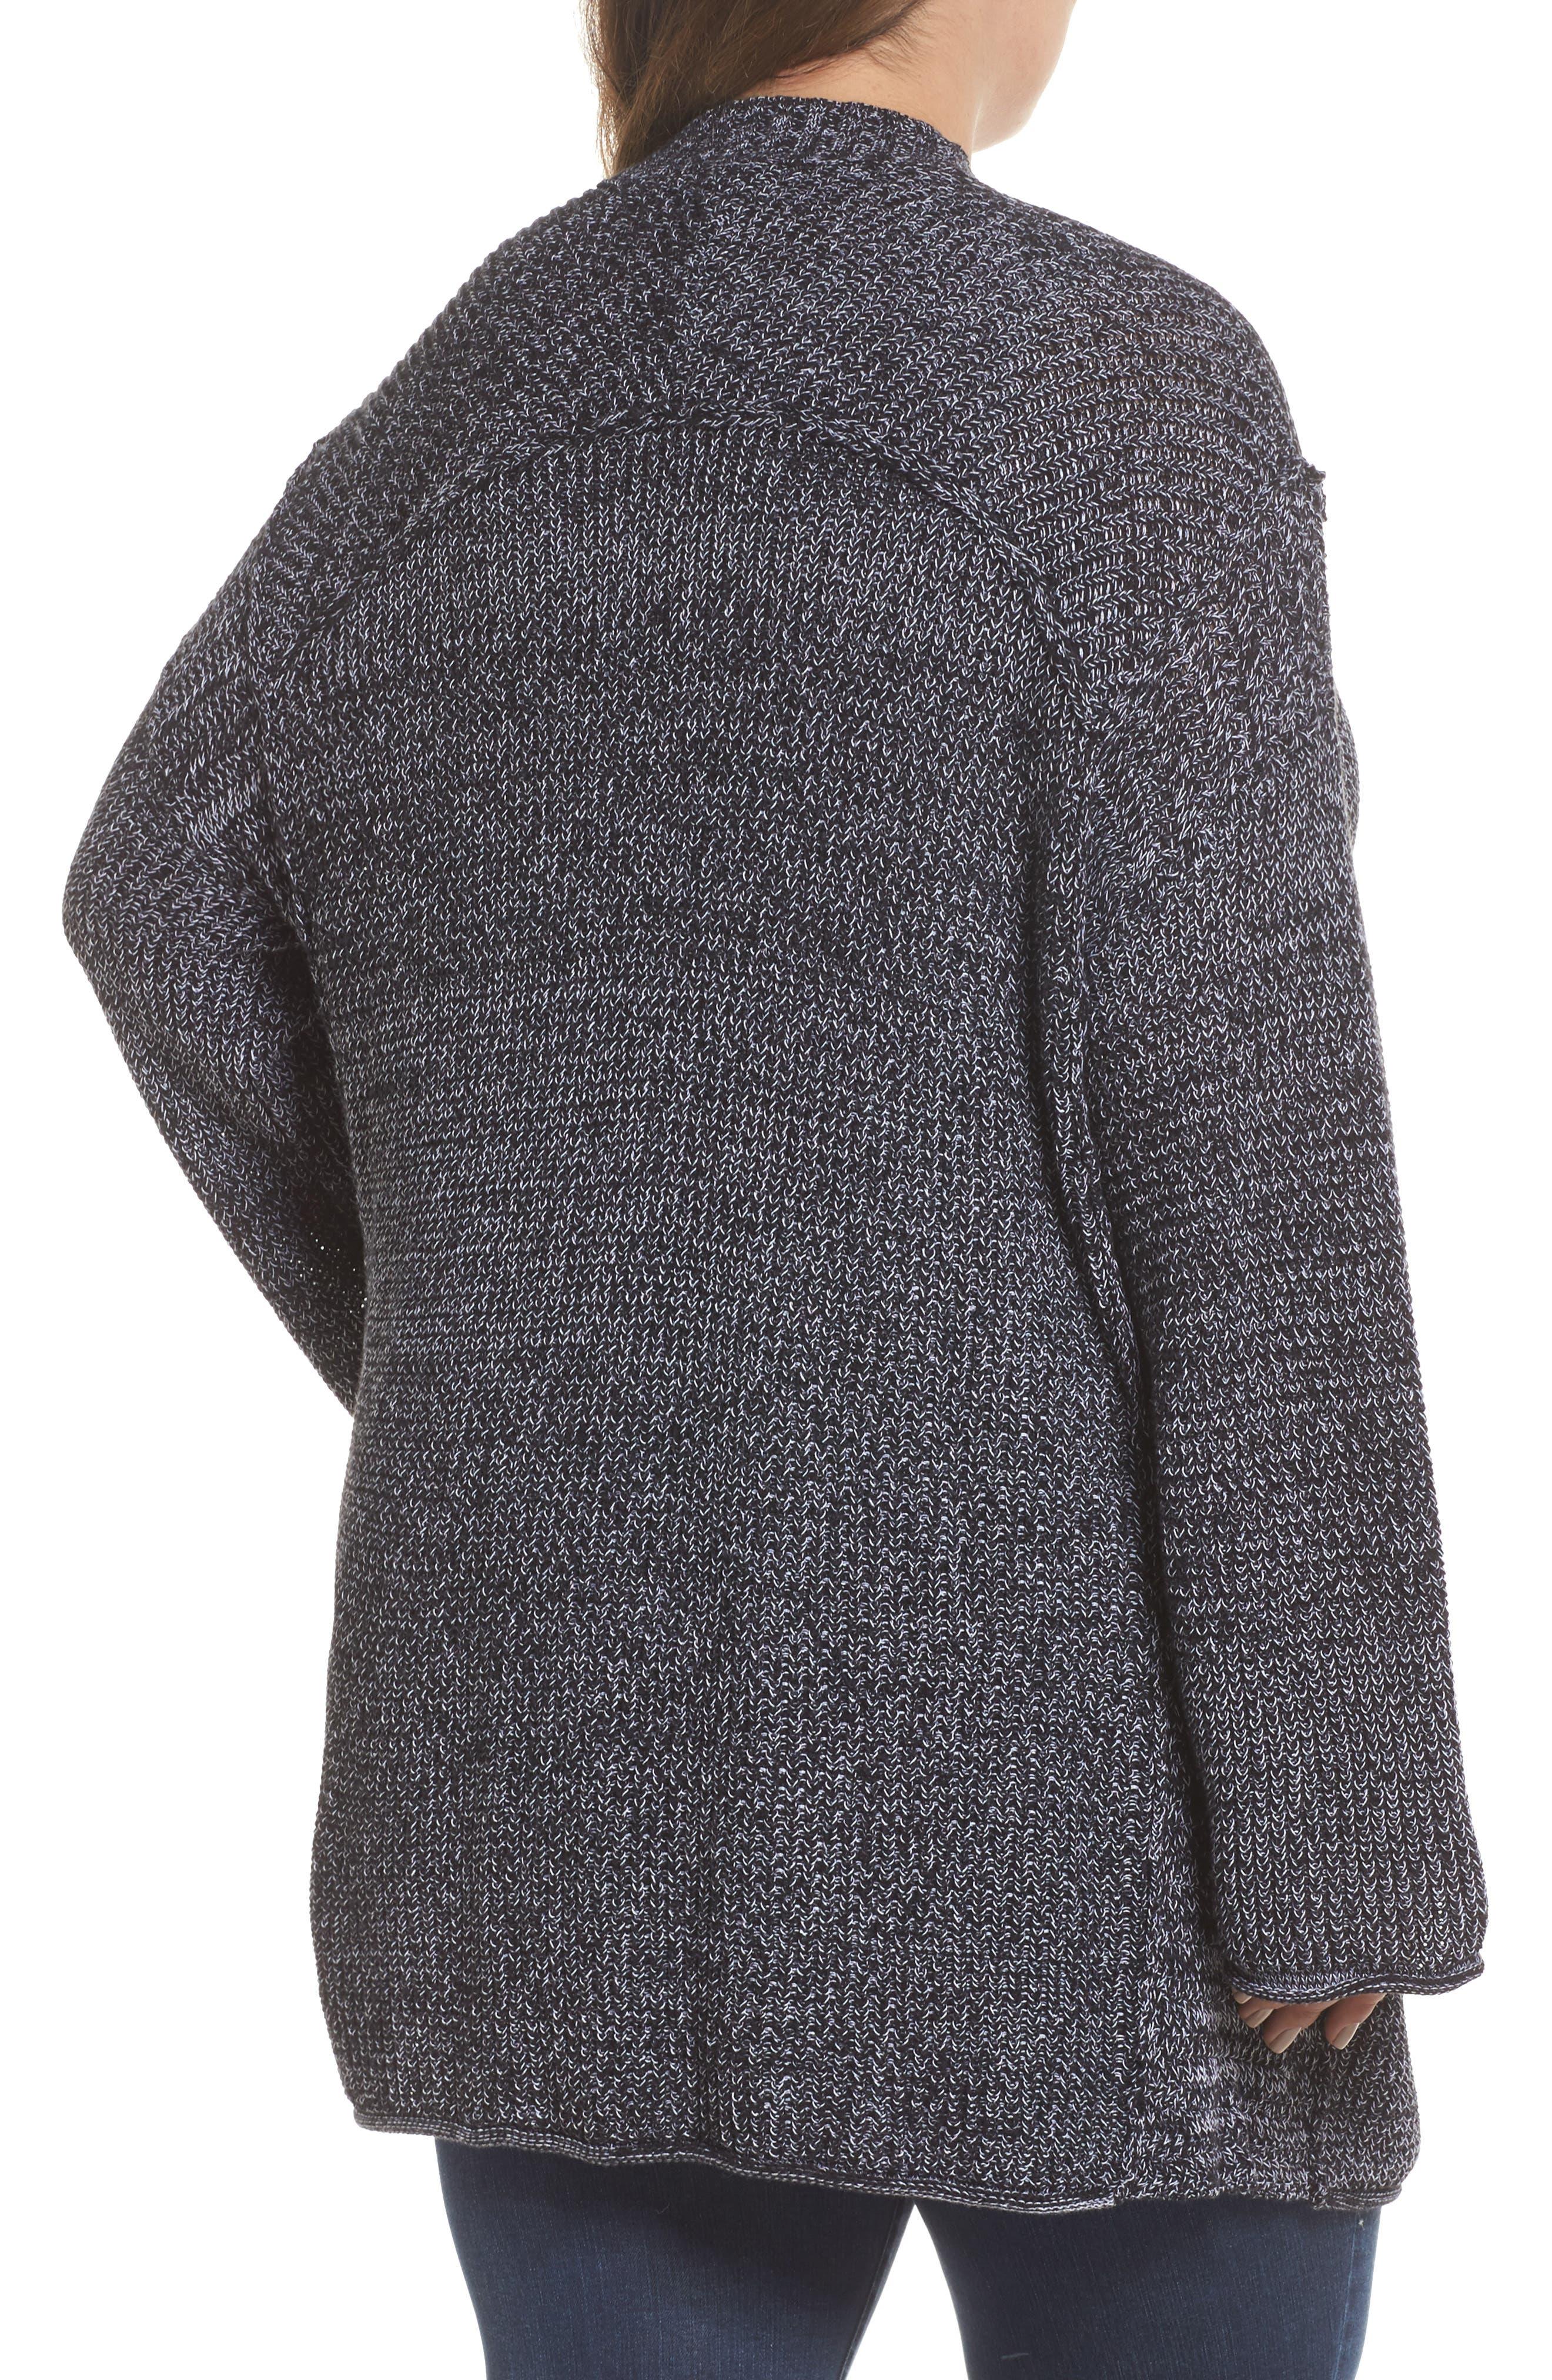 Sweater Knit Cardigan,                             Alternate thumbnail 2, color,                             001